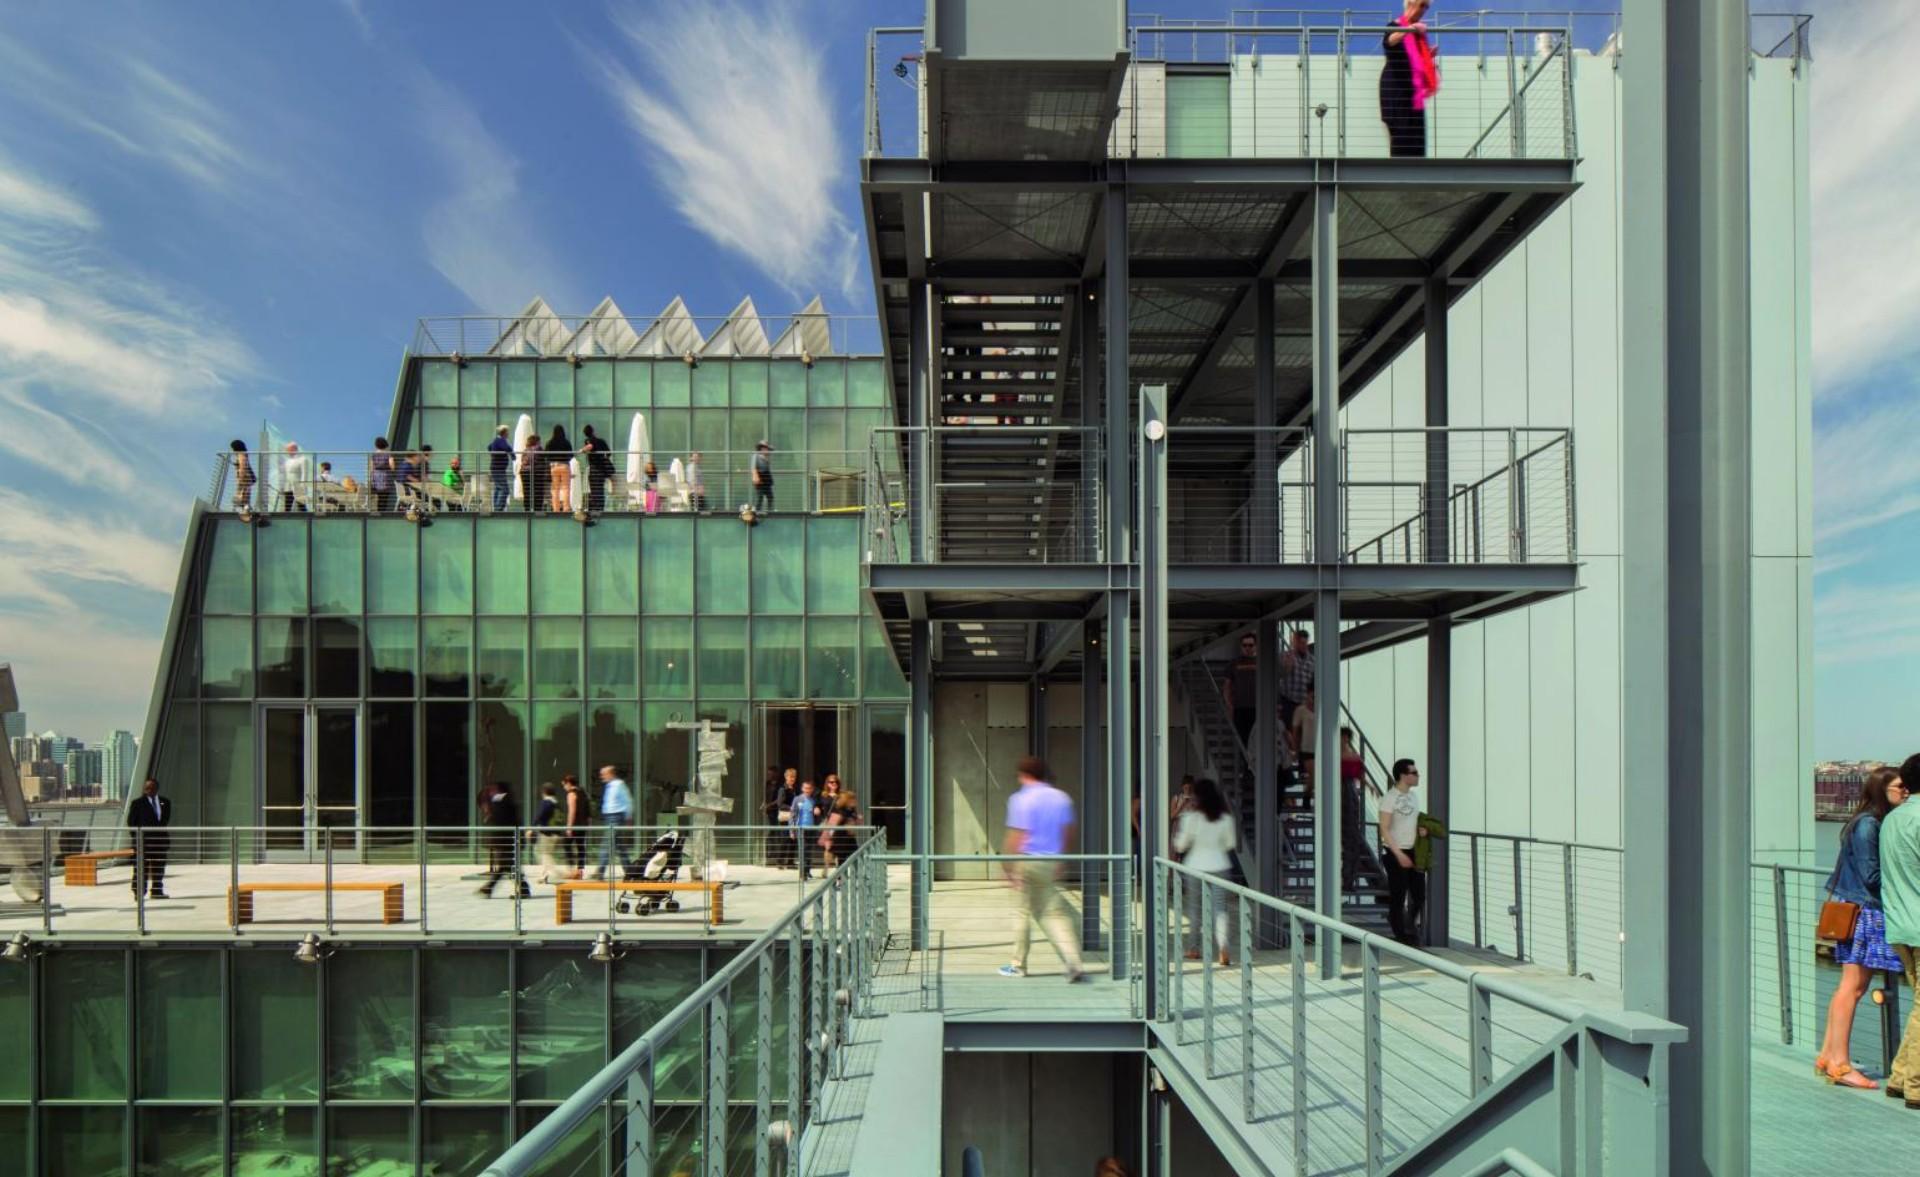 Exposición Renzo Piano: The Art of Making Buildings